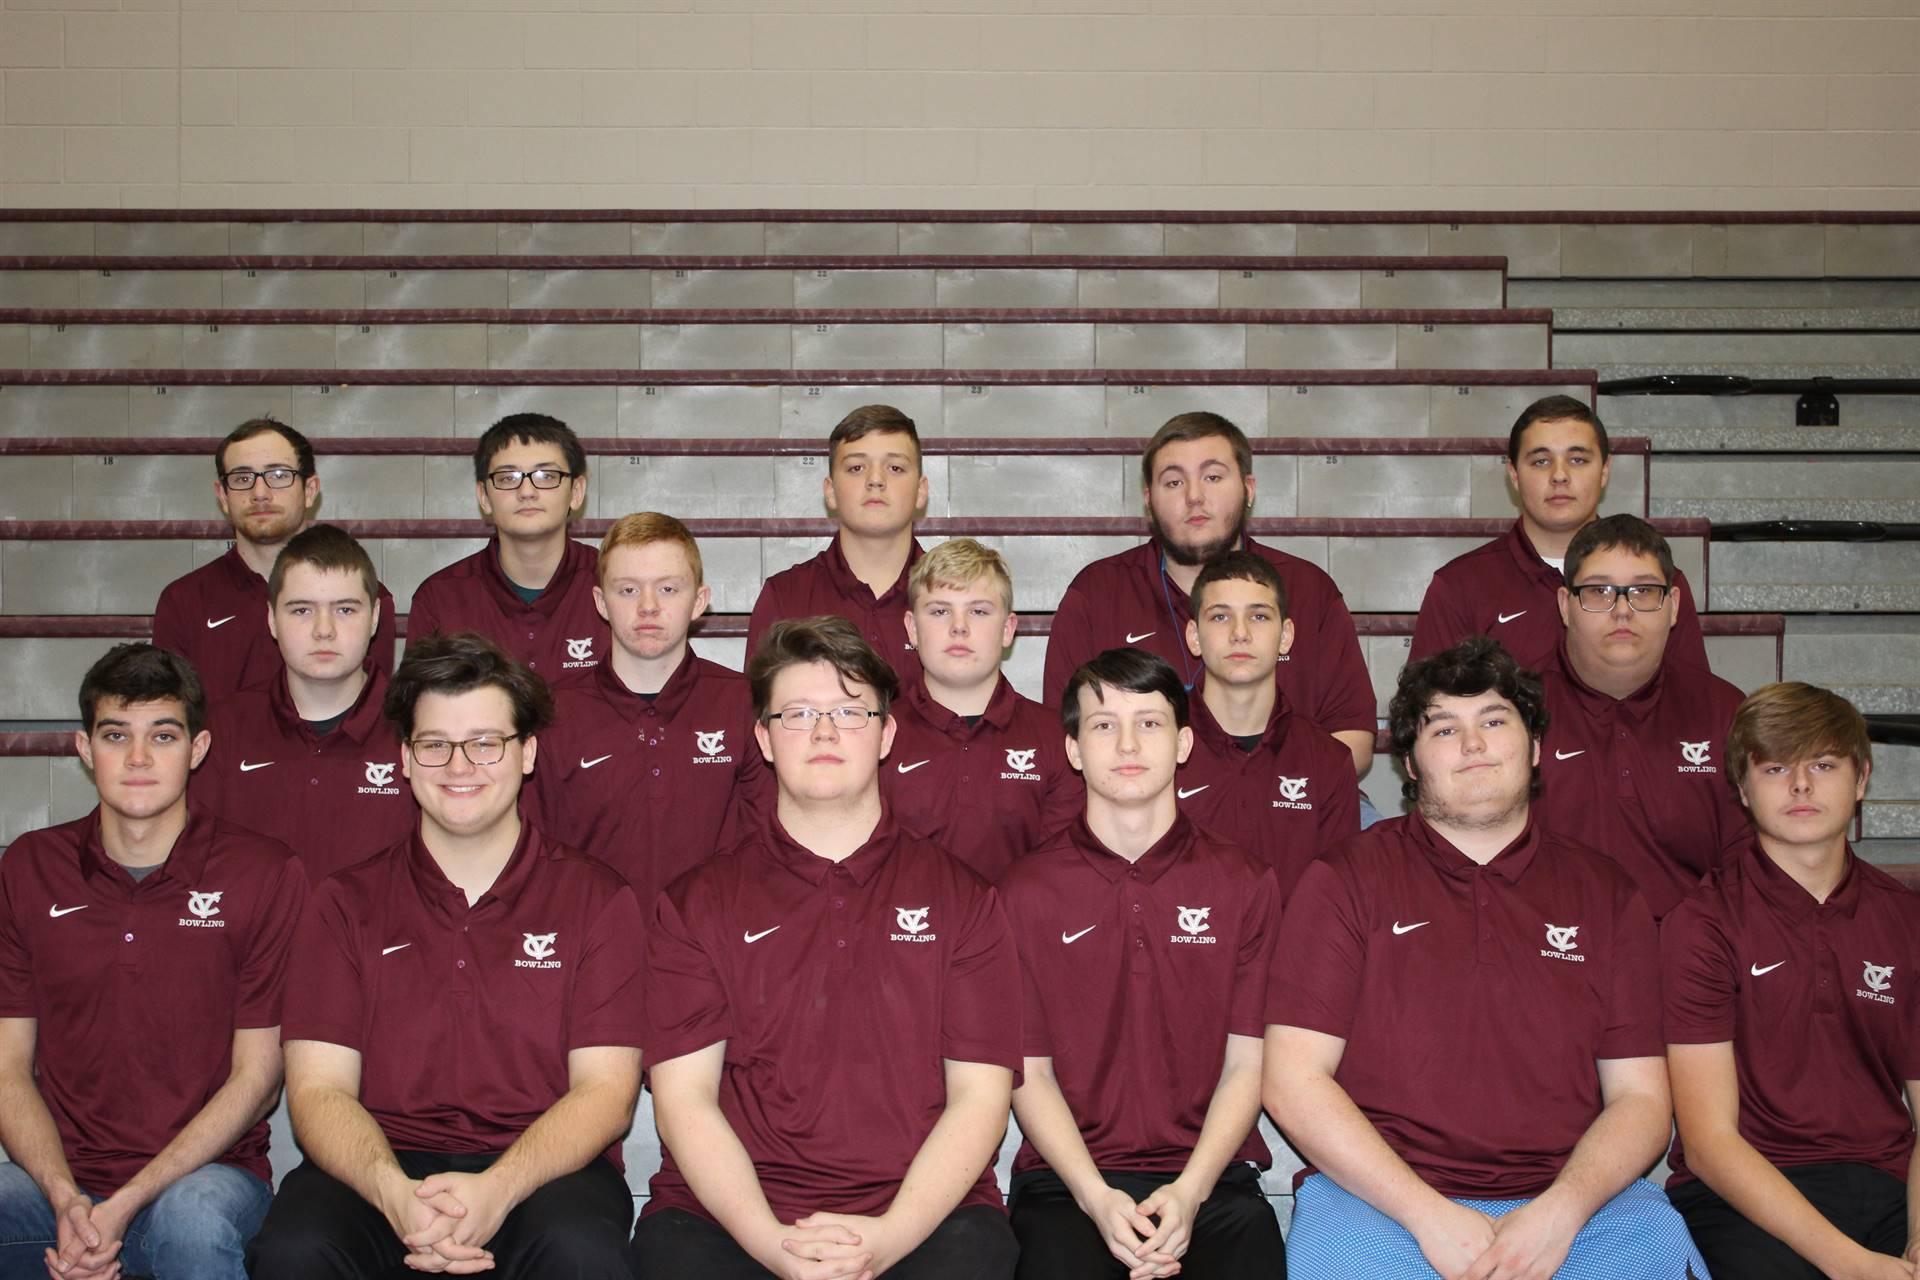 2018/2019 Boys Bowling Team